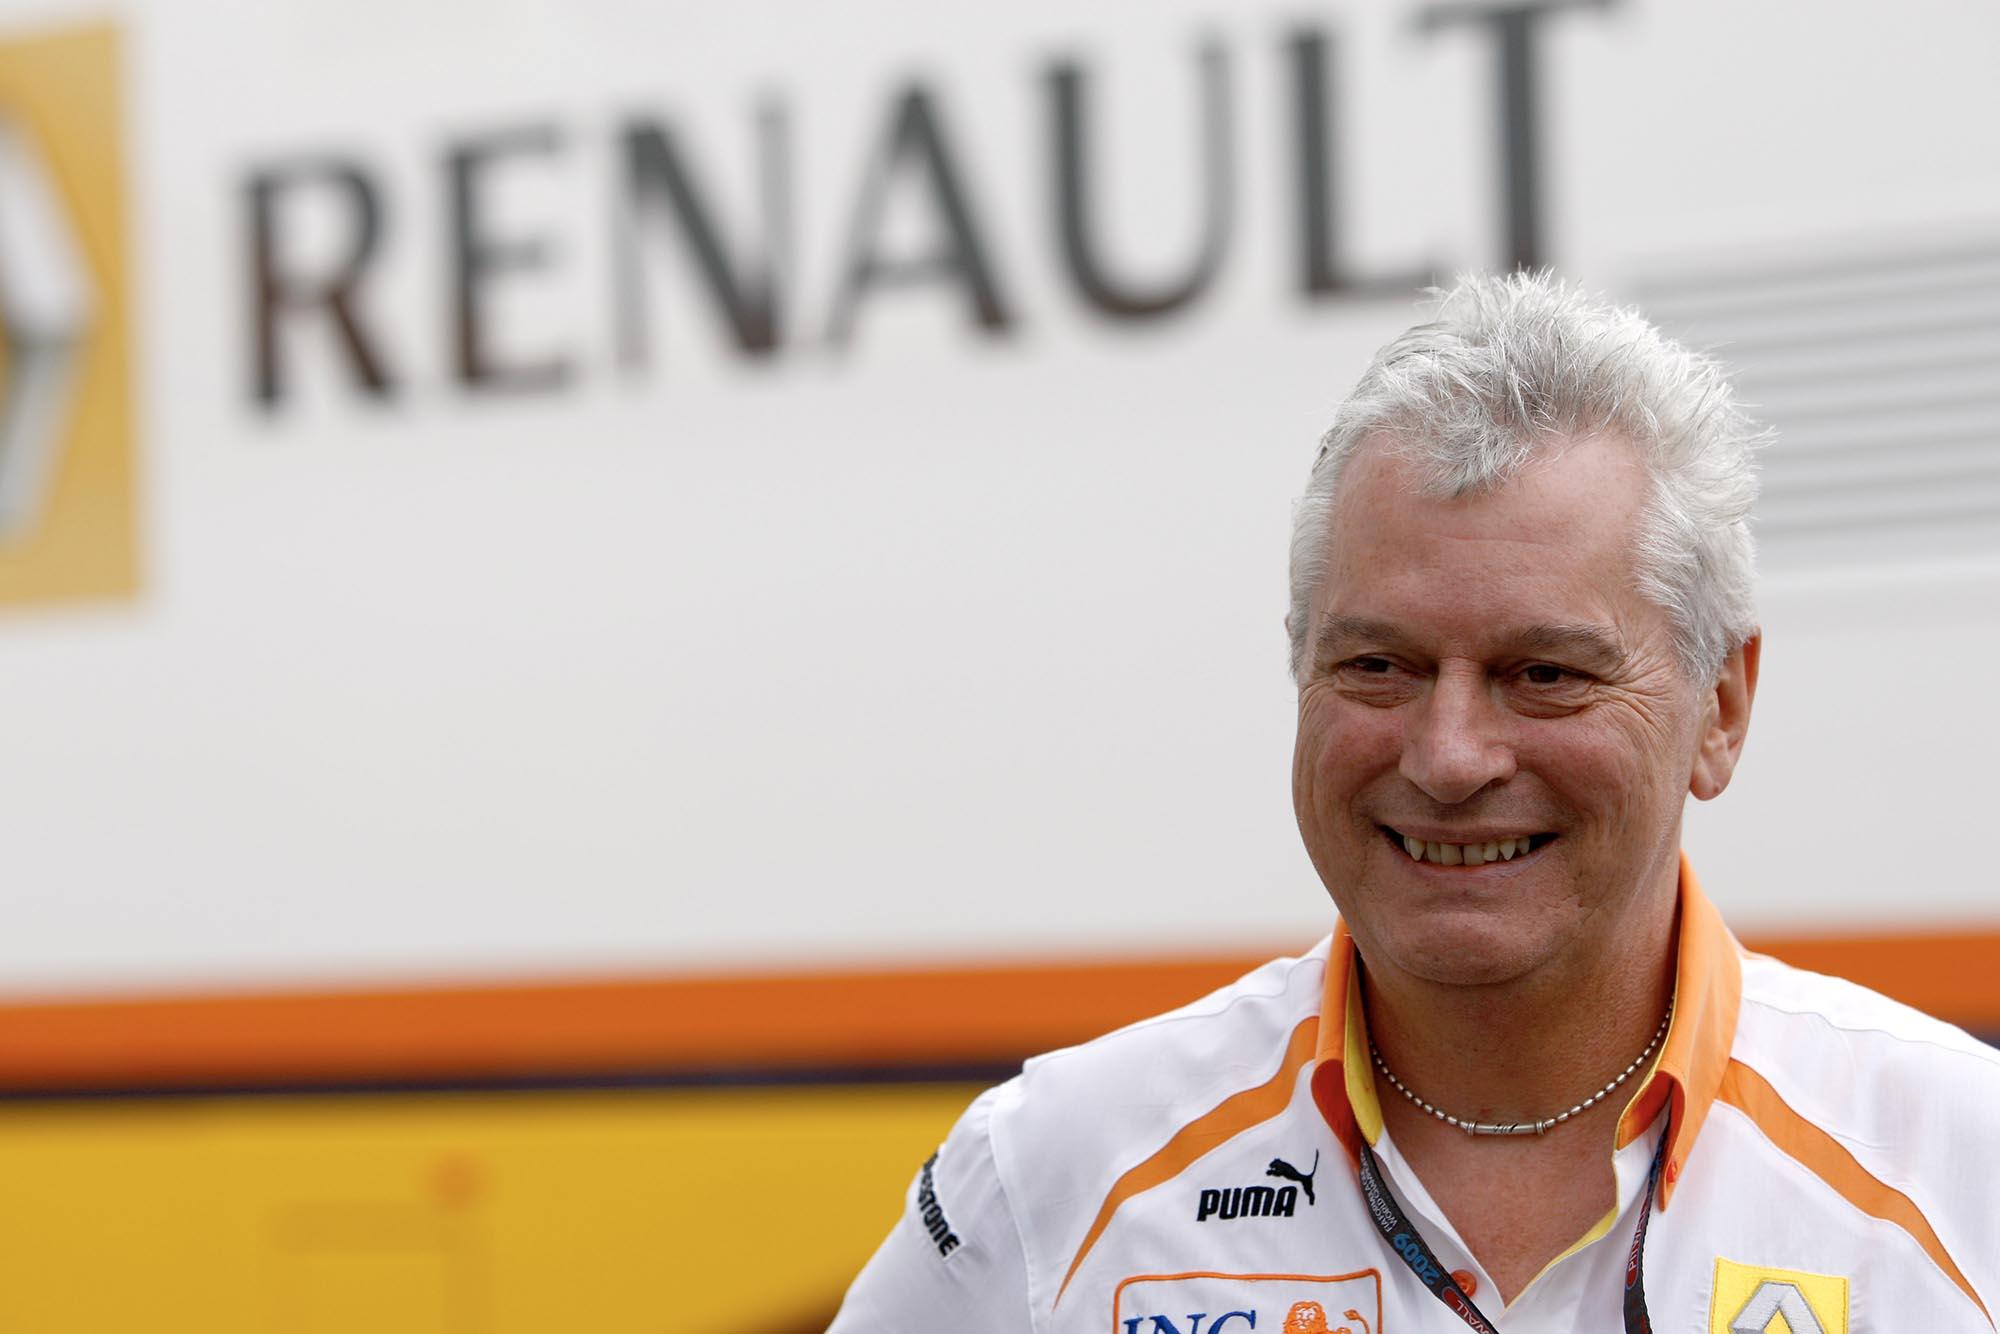 Pat Symonds Renault technical director at the 2009 British Grand Prix